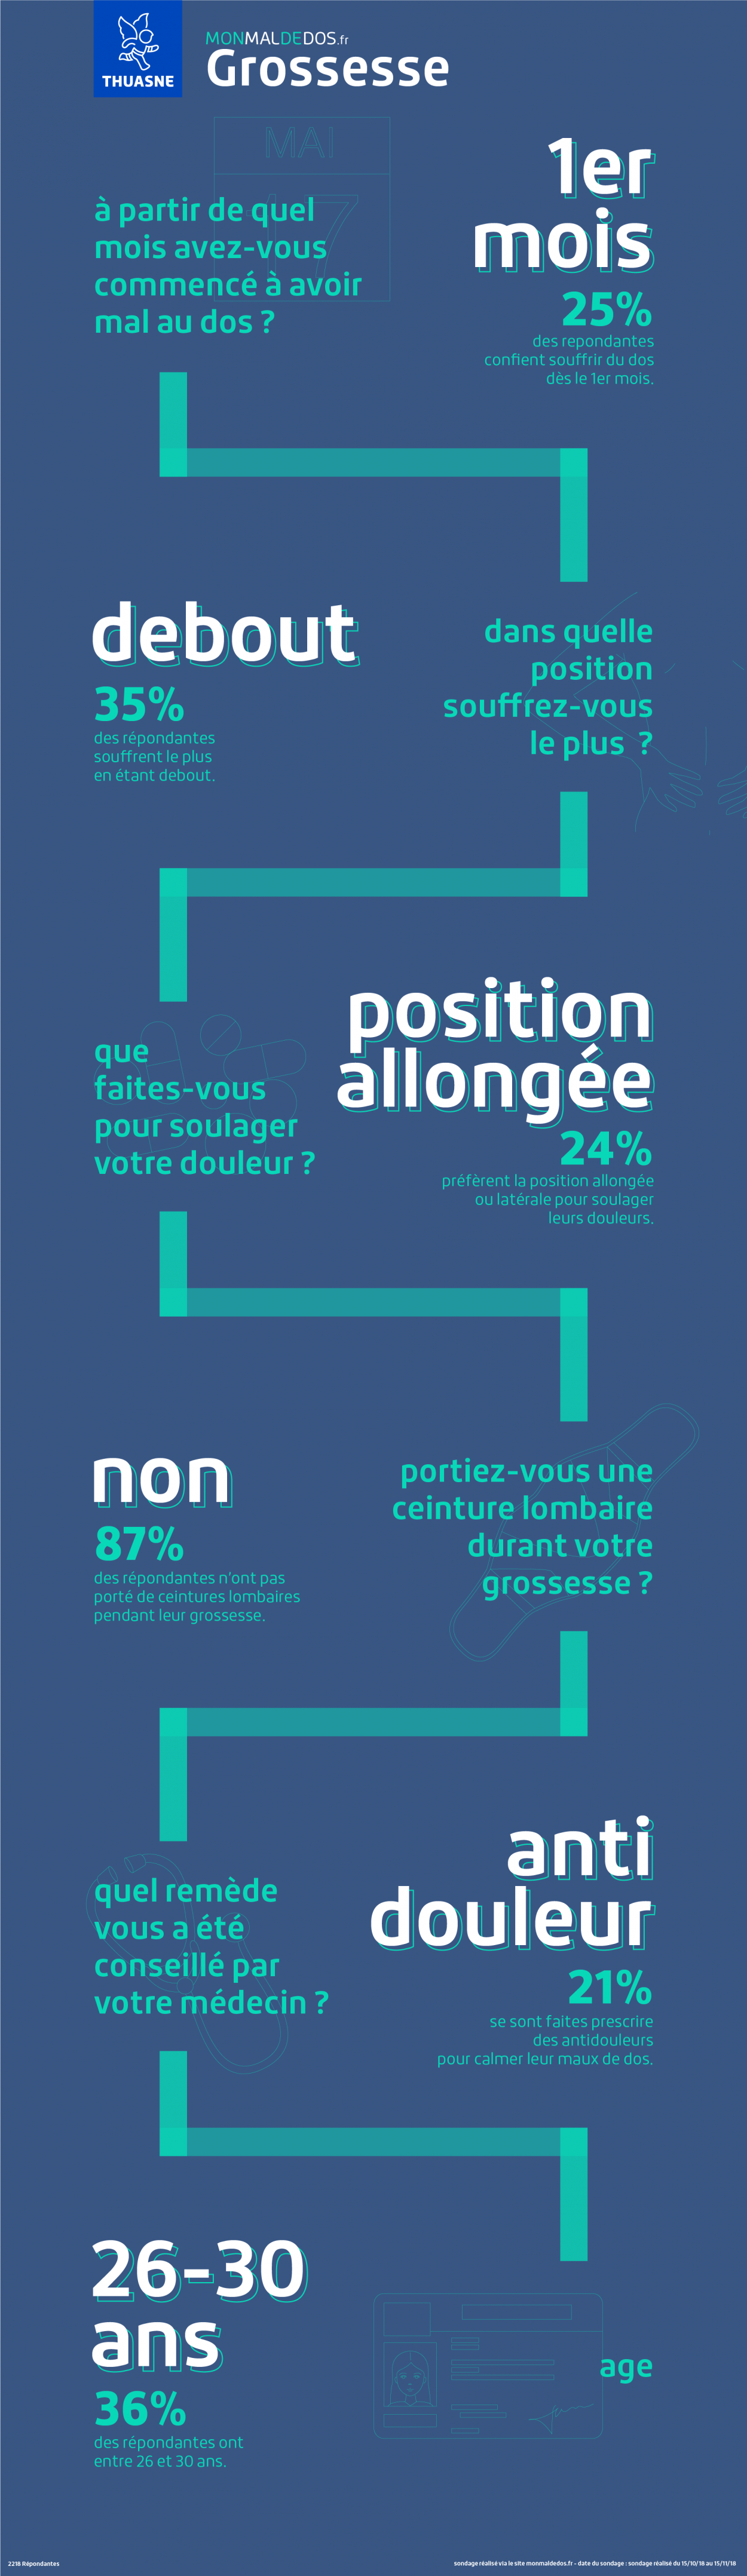 Infographie grossesse et mal de dos | monmaldedos.fr